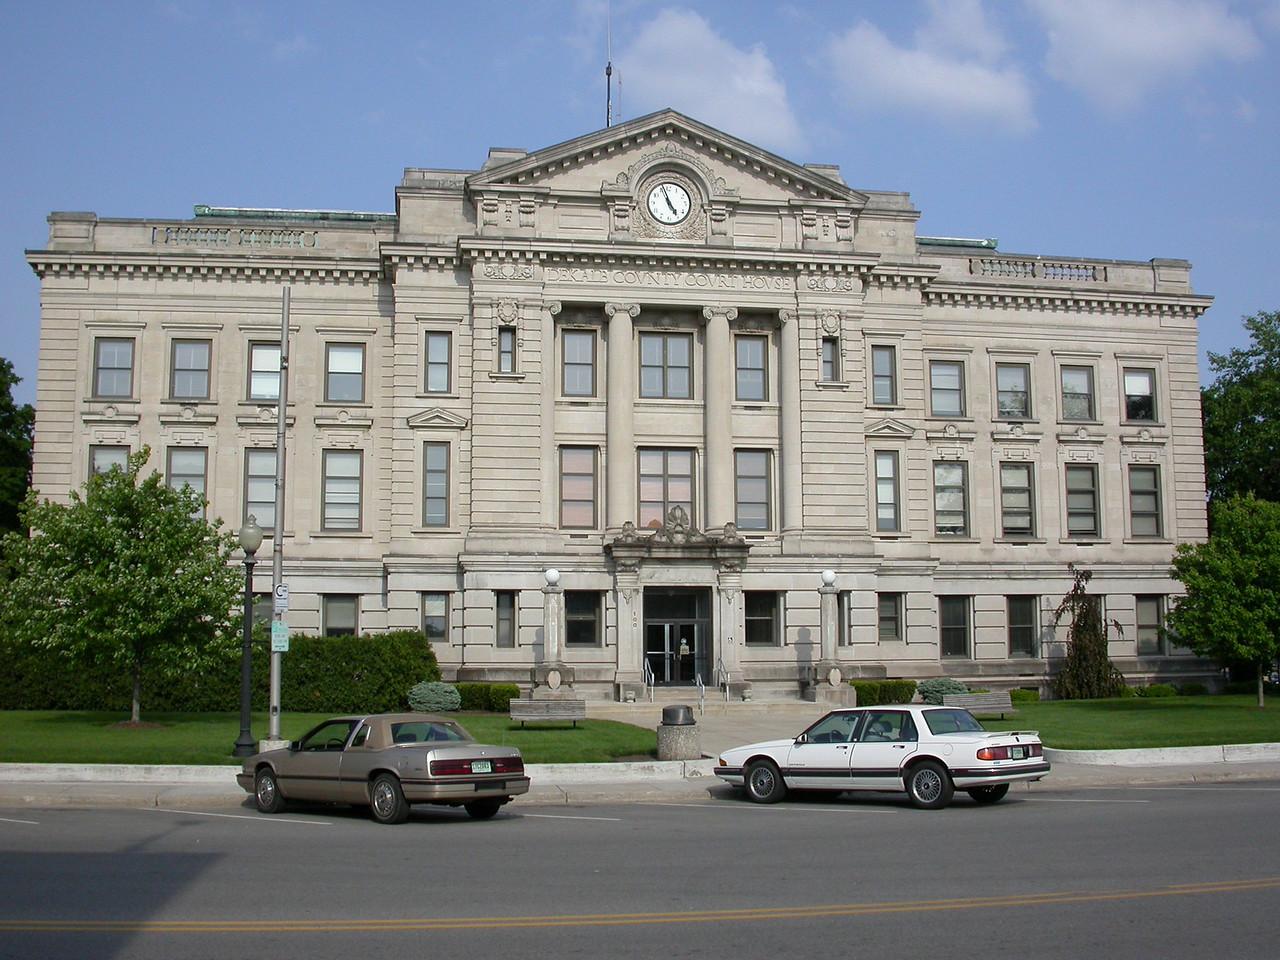 Dekalb County Courthouse, Auburn, Indiana, May 2004.